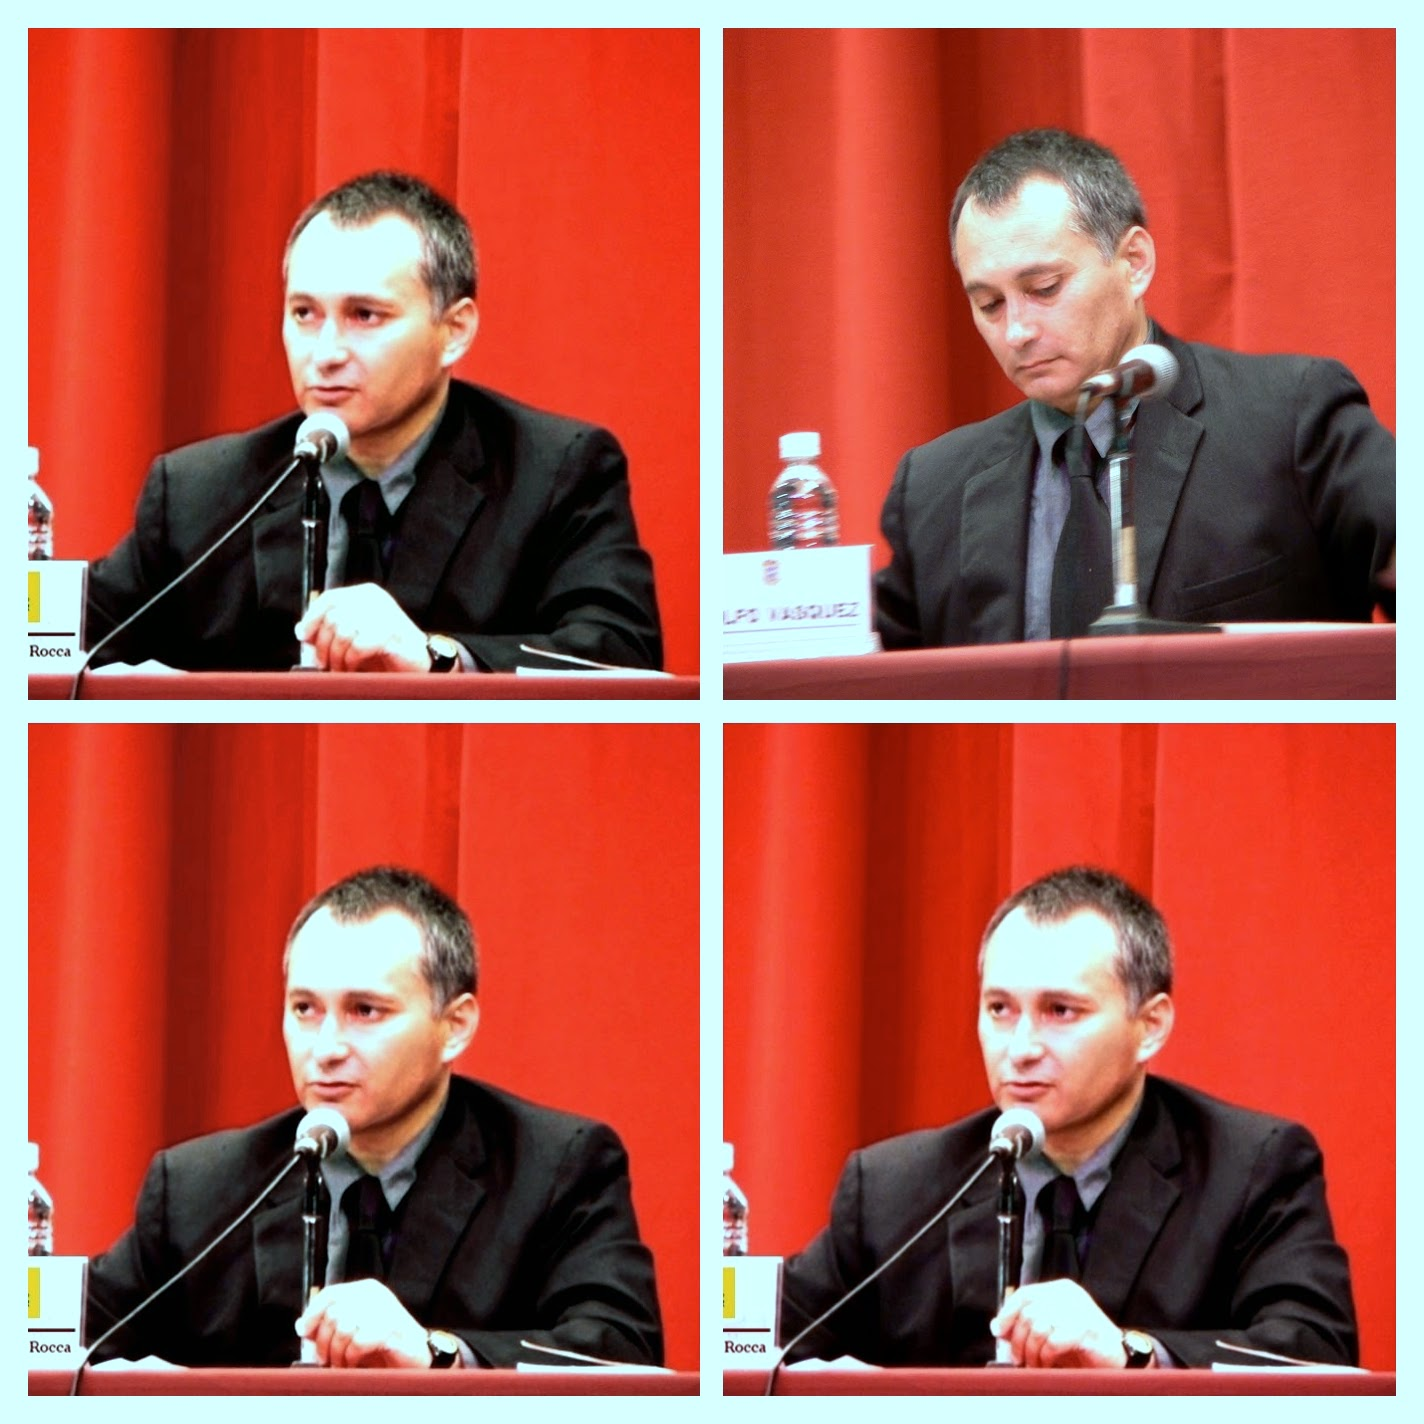 http://2.bp.blogspot.com/-GlD0FW7I-jM/U7Dh59W_2sI/AAAAAAAAVIw/UuJ96JKow6k/s1600/Adolfo+Vasquez+Rocca+PHD+_+Congreso+Internacional+de+Filosof%C3%ADa+UCM_UAB+2012+-MIX.jpg